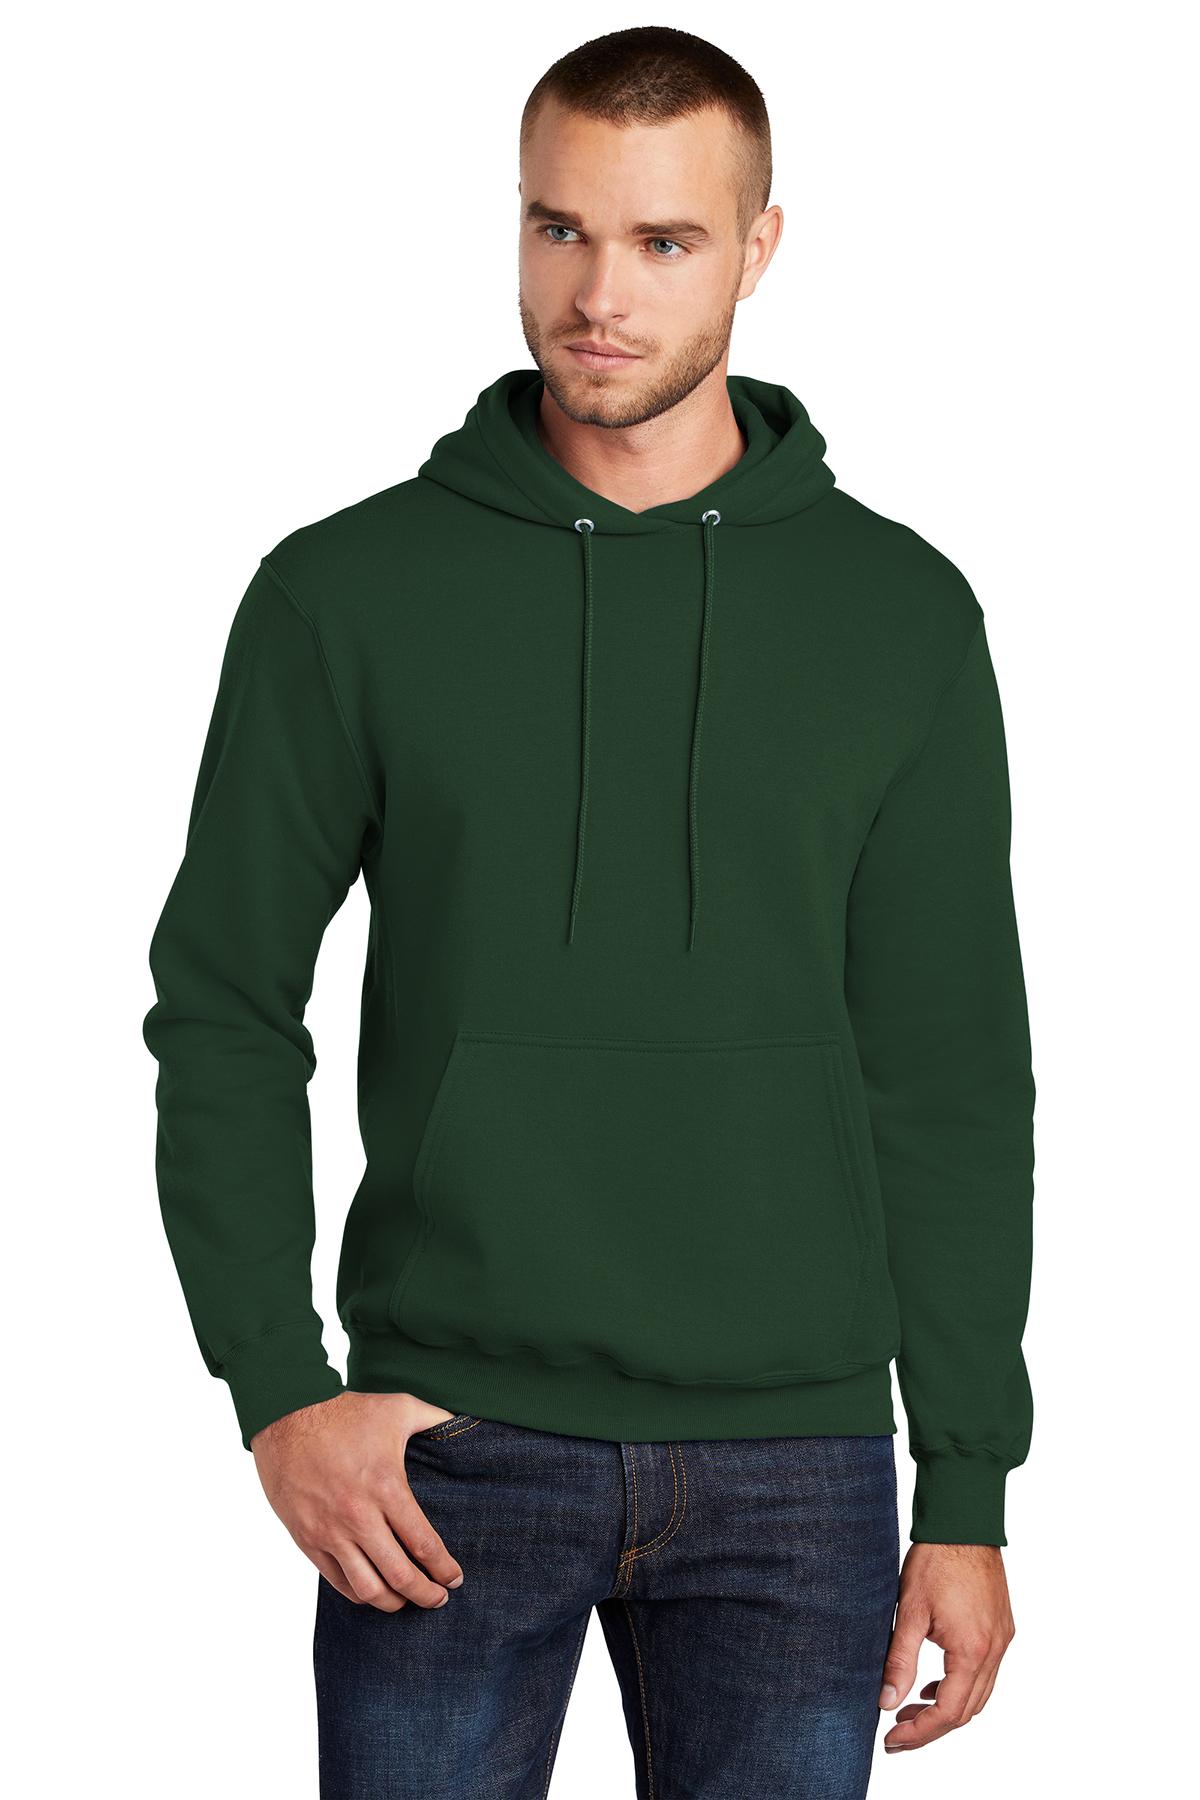 Port /& Company Core Fleece Pullover Hooded Sweatshirt PC78H Heather Dark Chocolate Brown 4XL